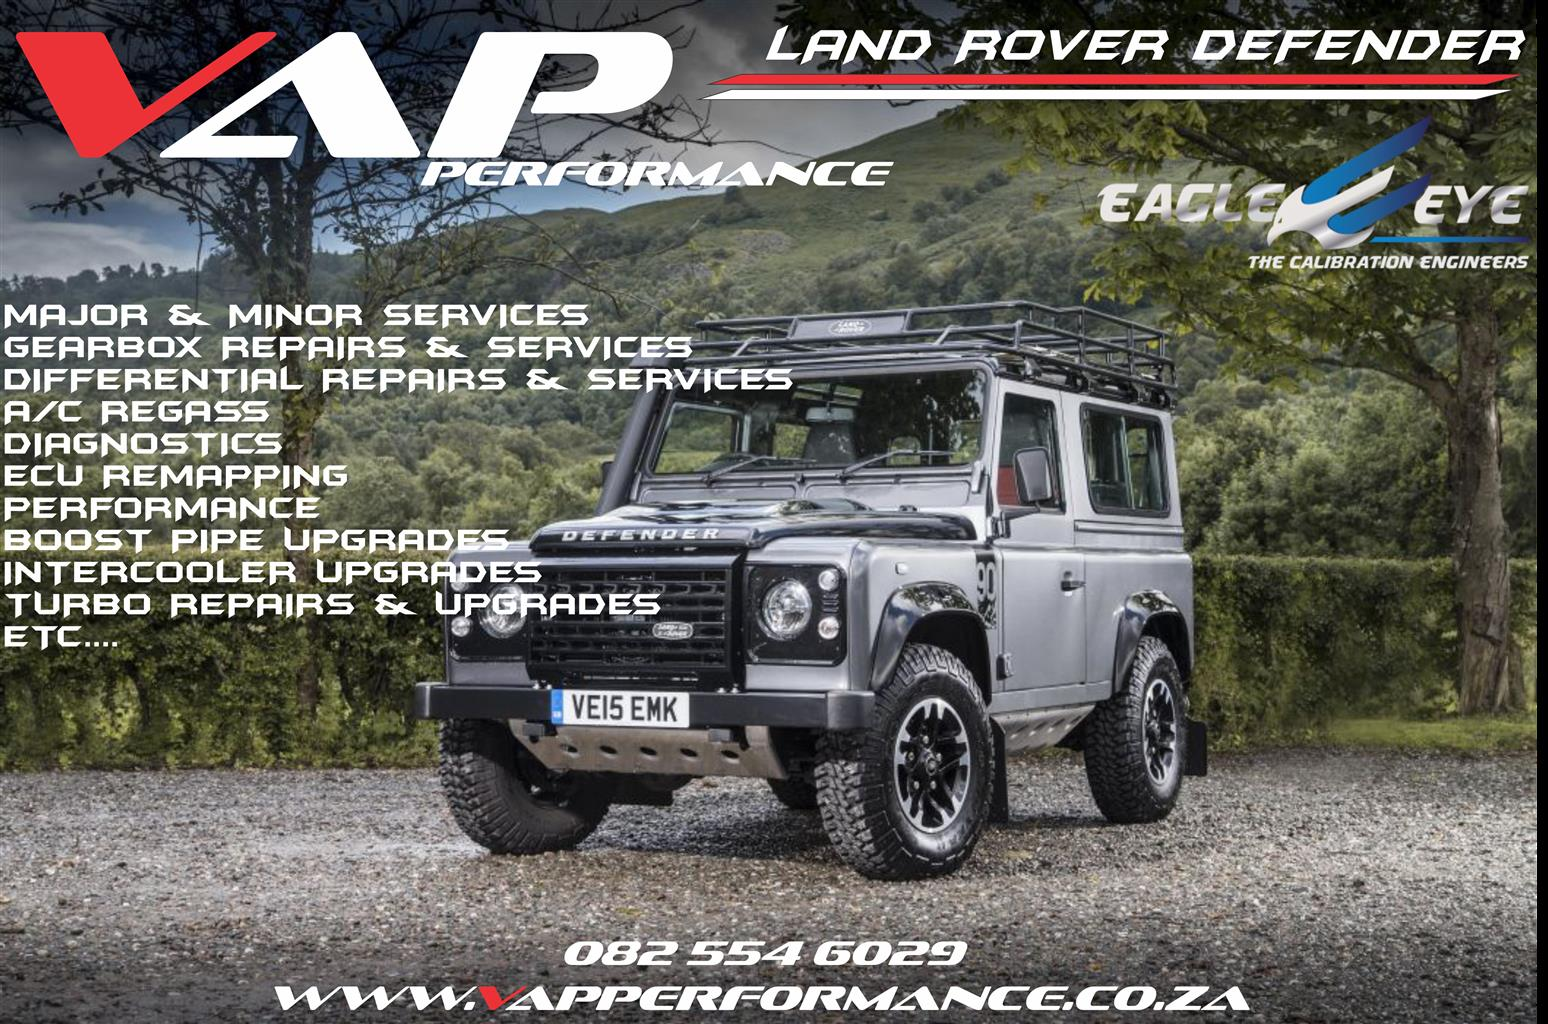 Land Rover Defender ECU Remapping / ECU Tuning / Performance